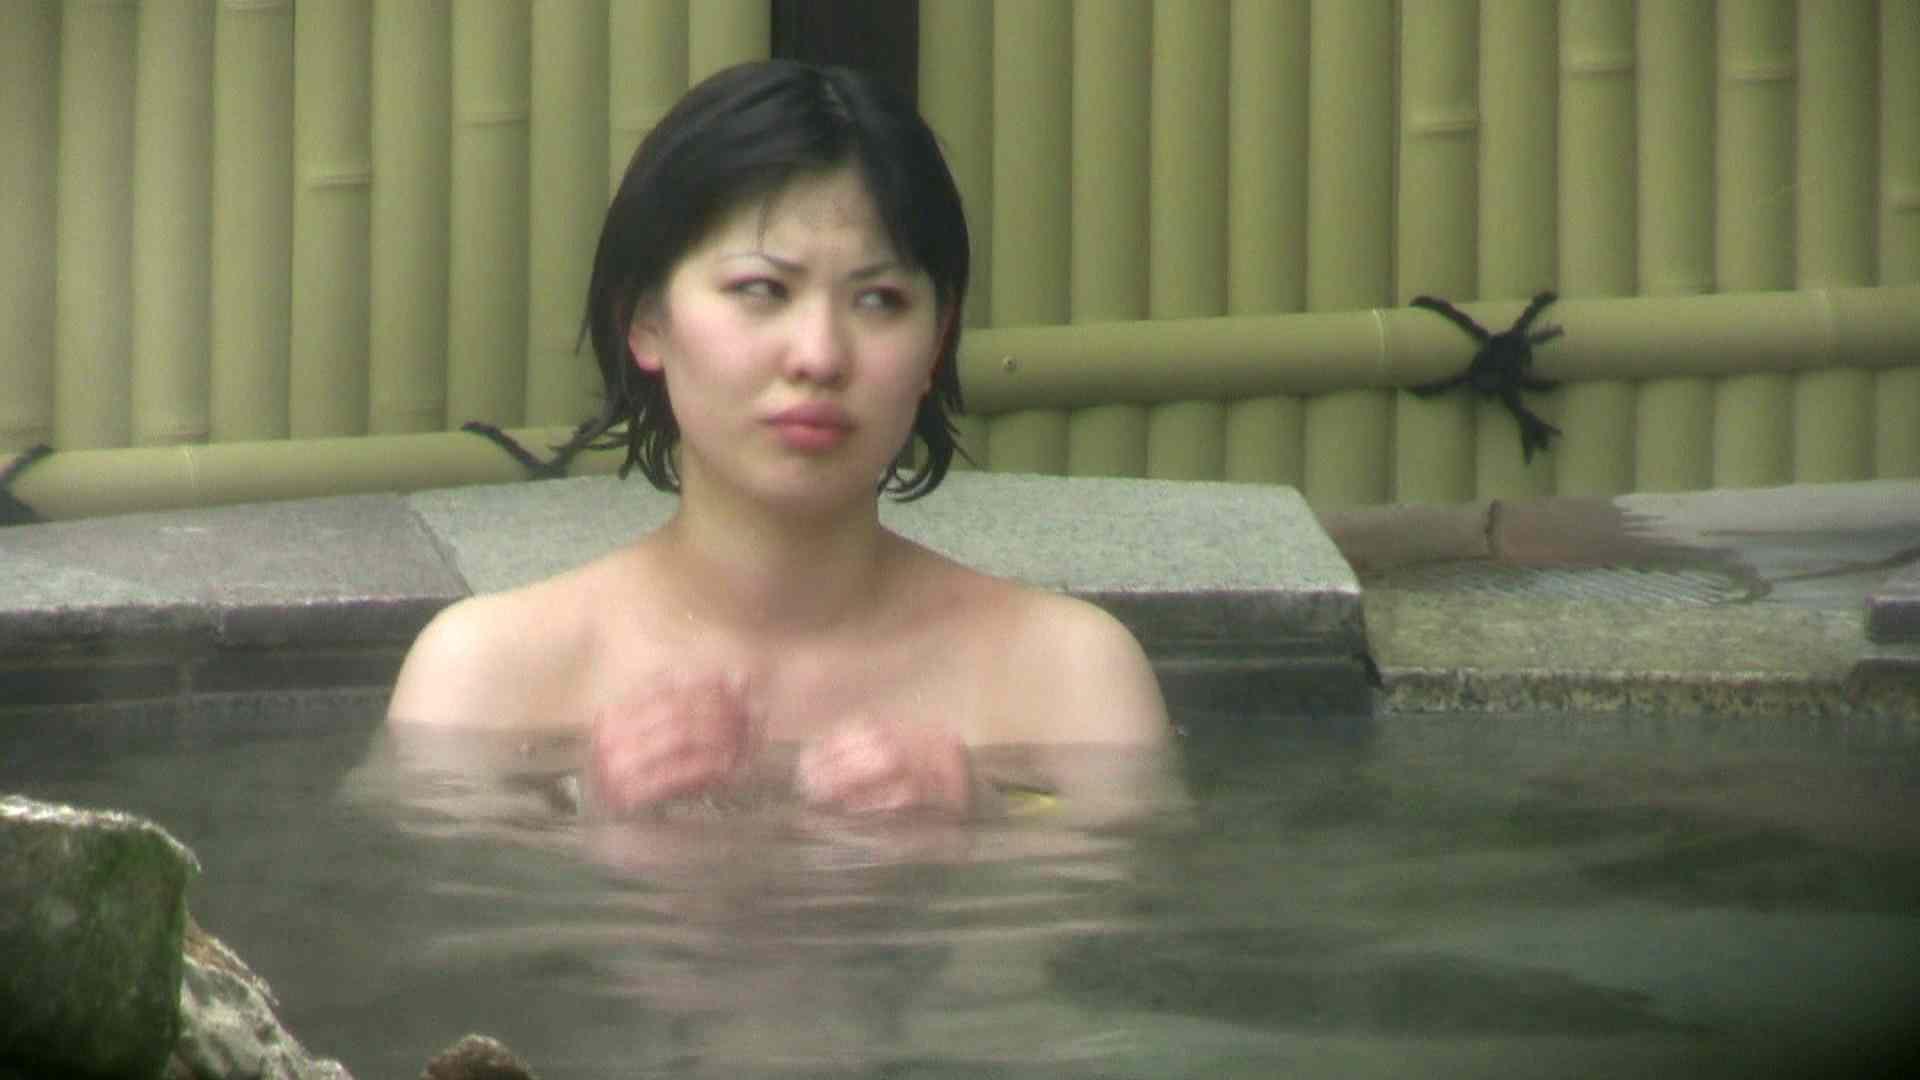 Aquaな露天風呂Vol.114 盗撮映像  72Pix 30